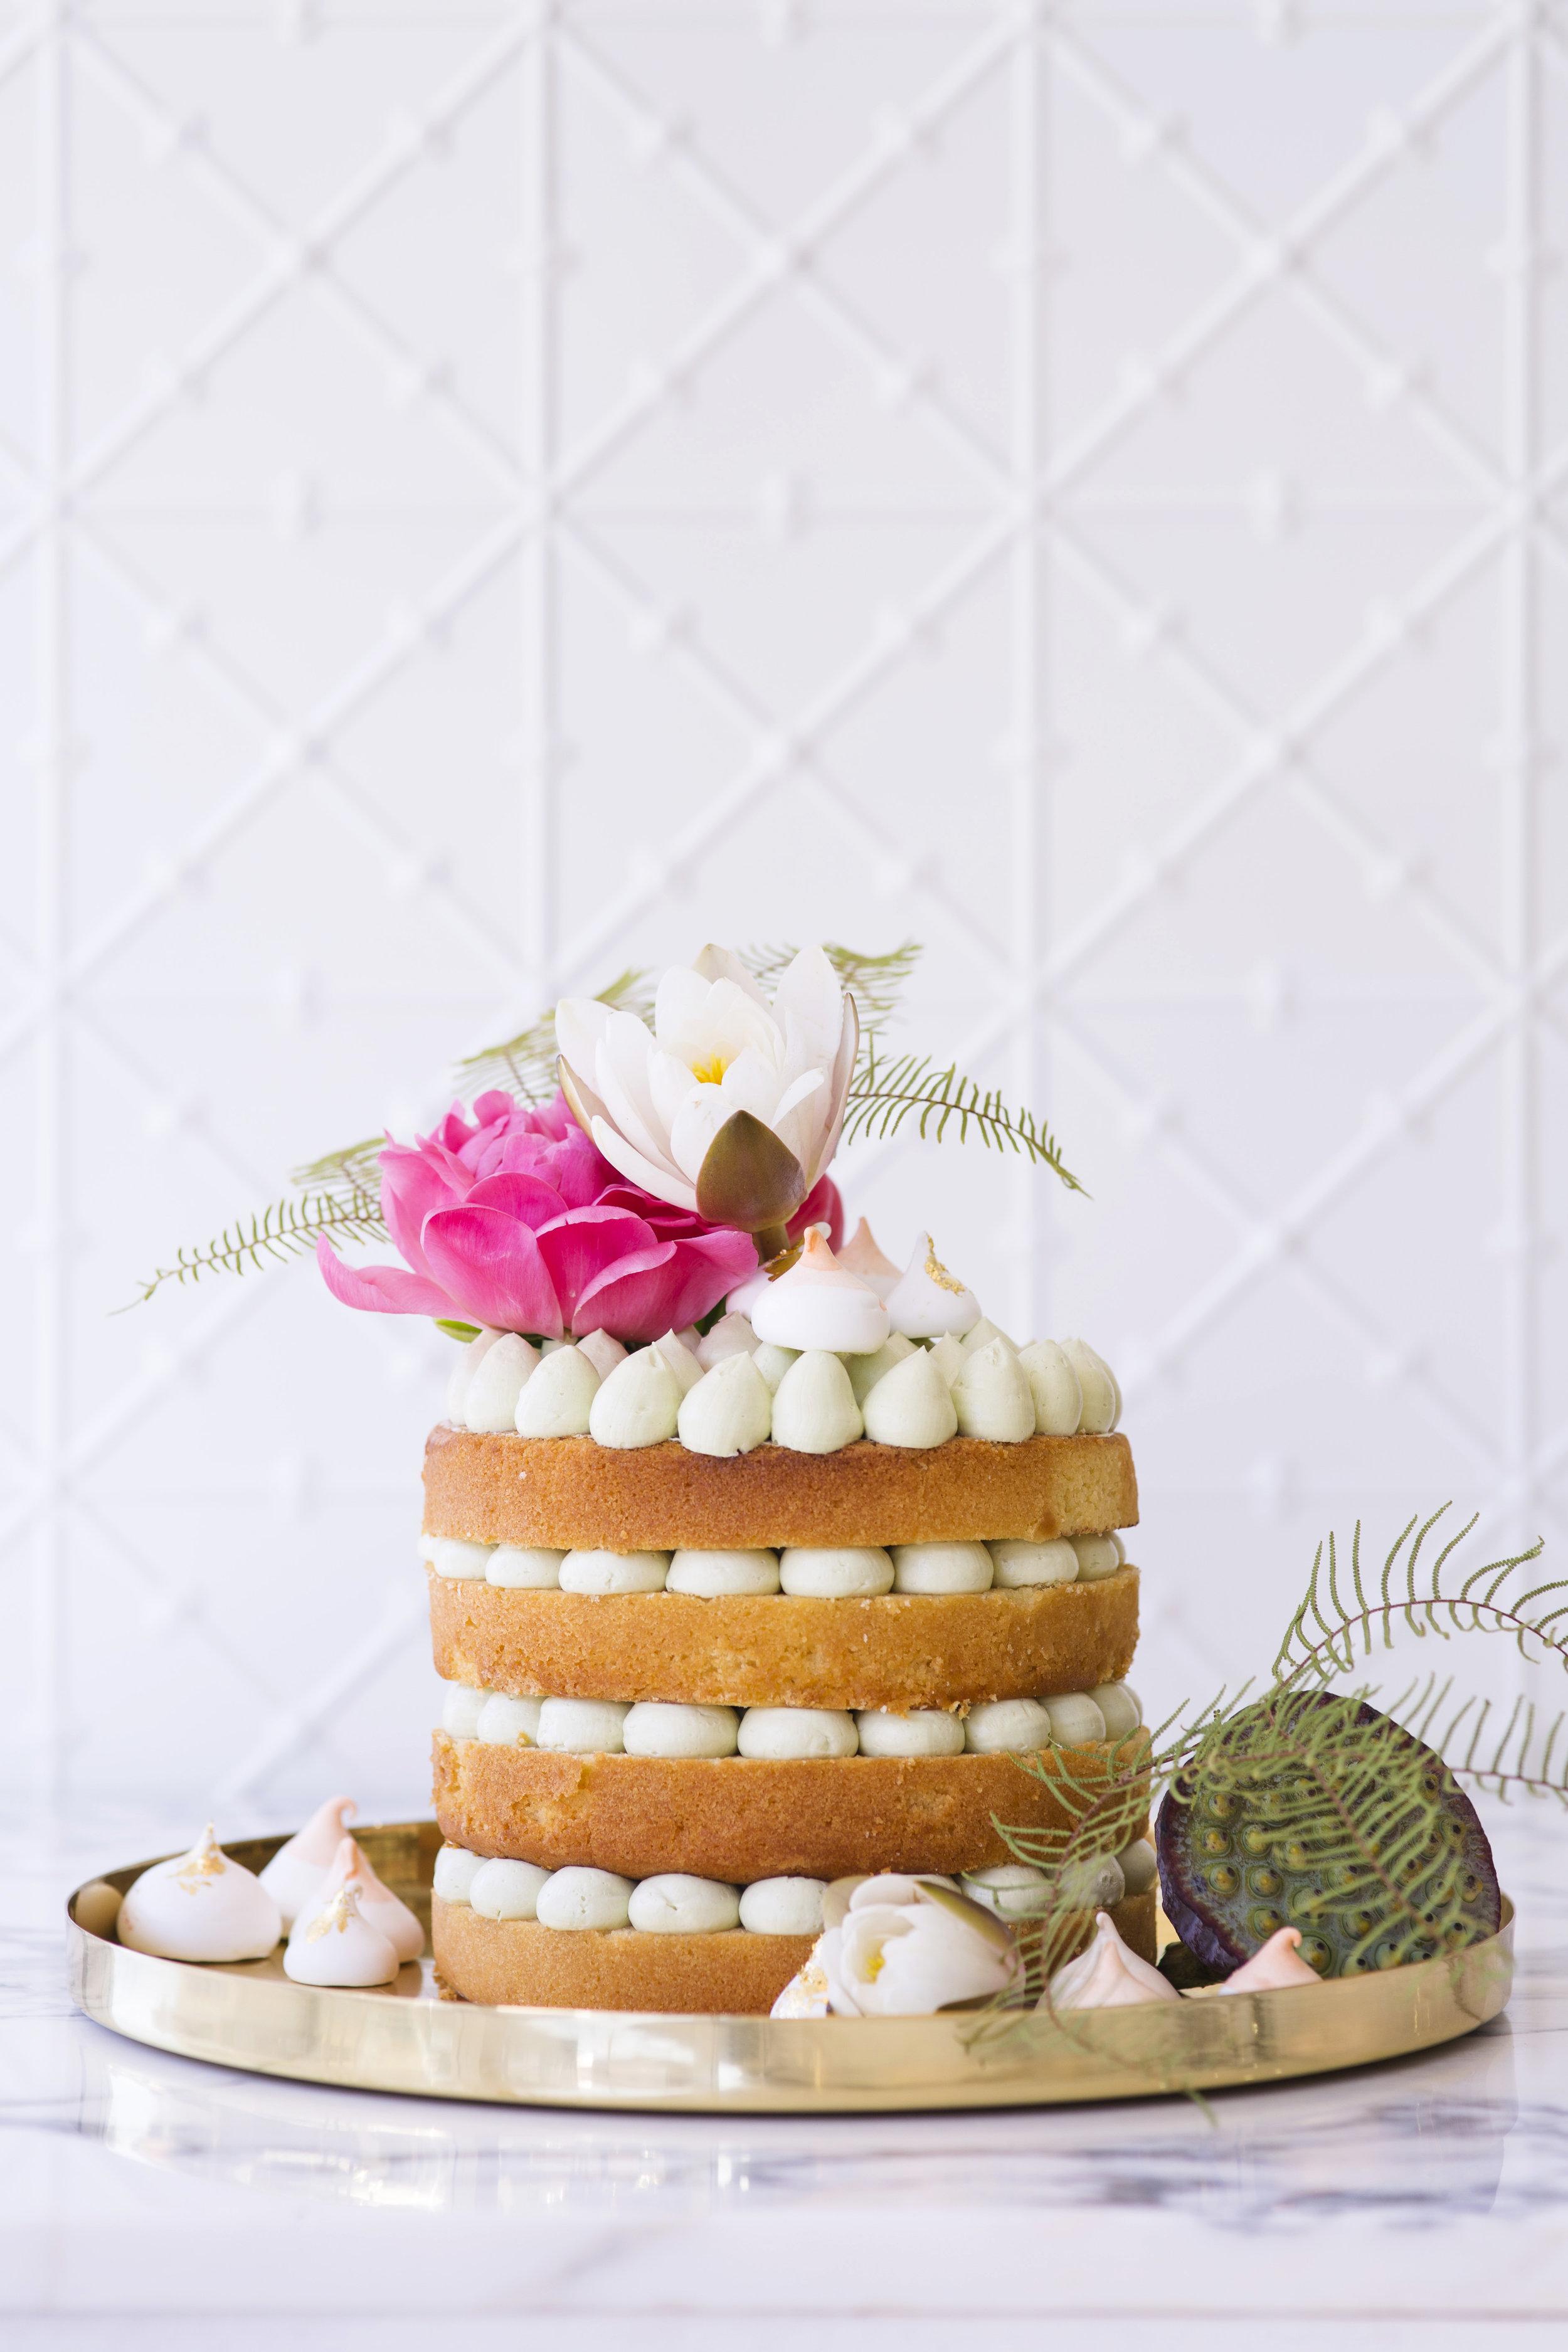 BLOODWOOD BOTANICA X Faye Cahill | Tropical wedding cake